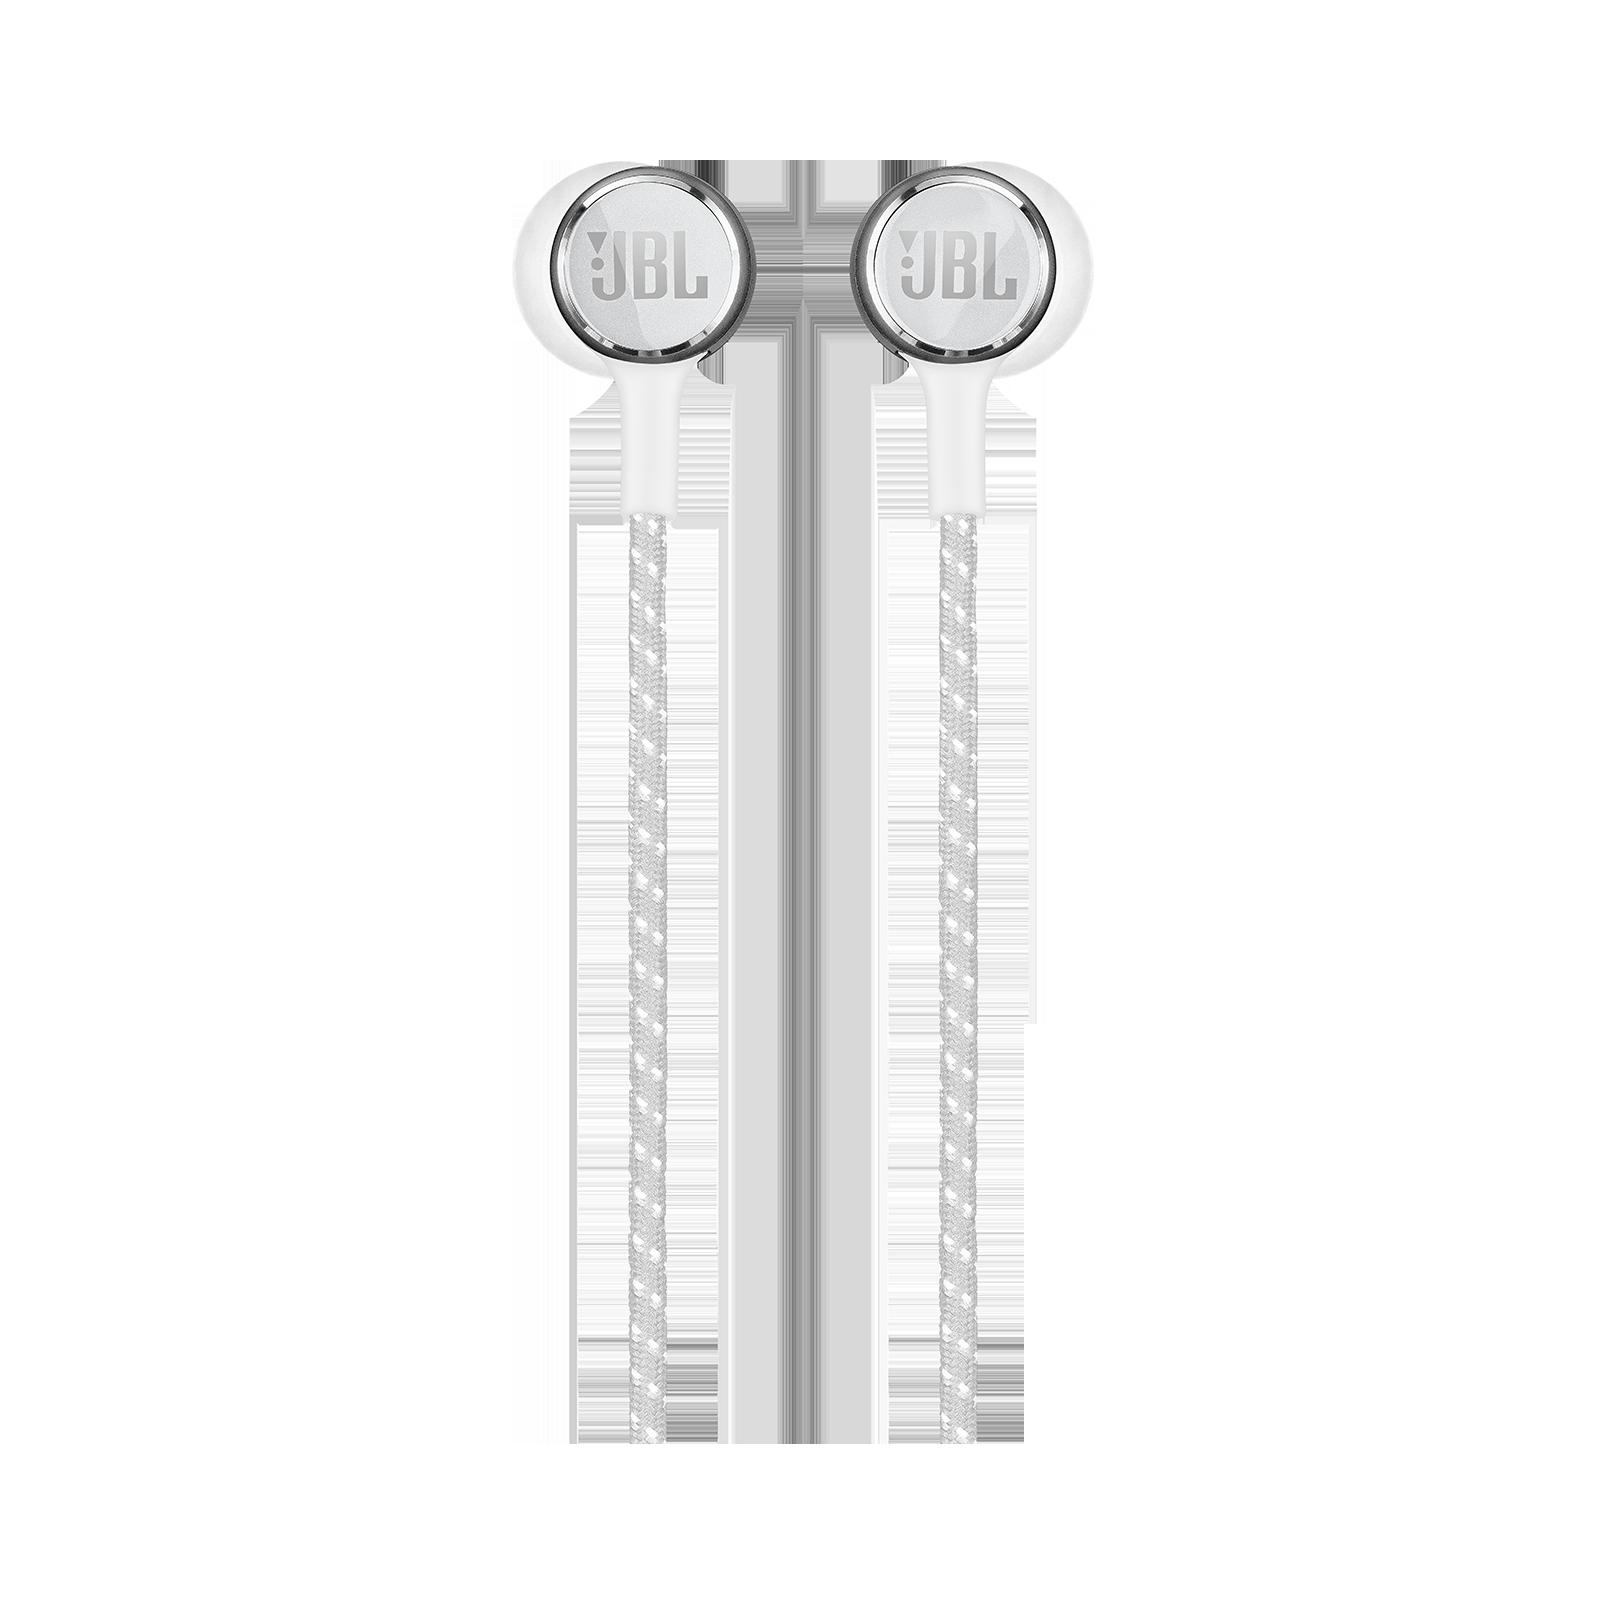 JBL LIVE 200BT - White - Wireless in-ear neckband headphones - Front